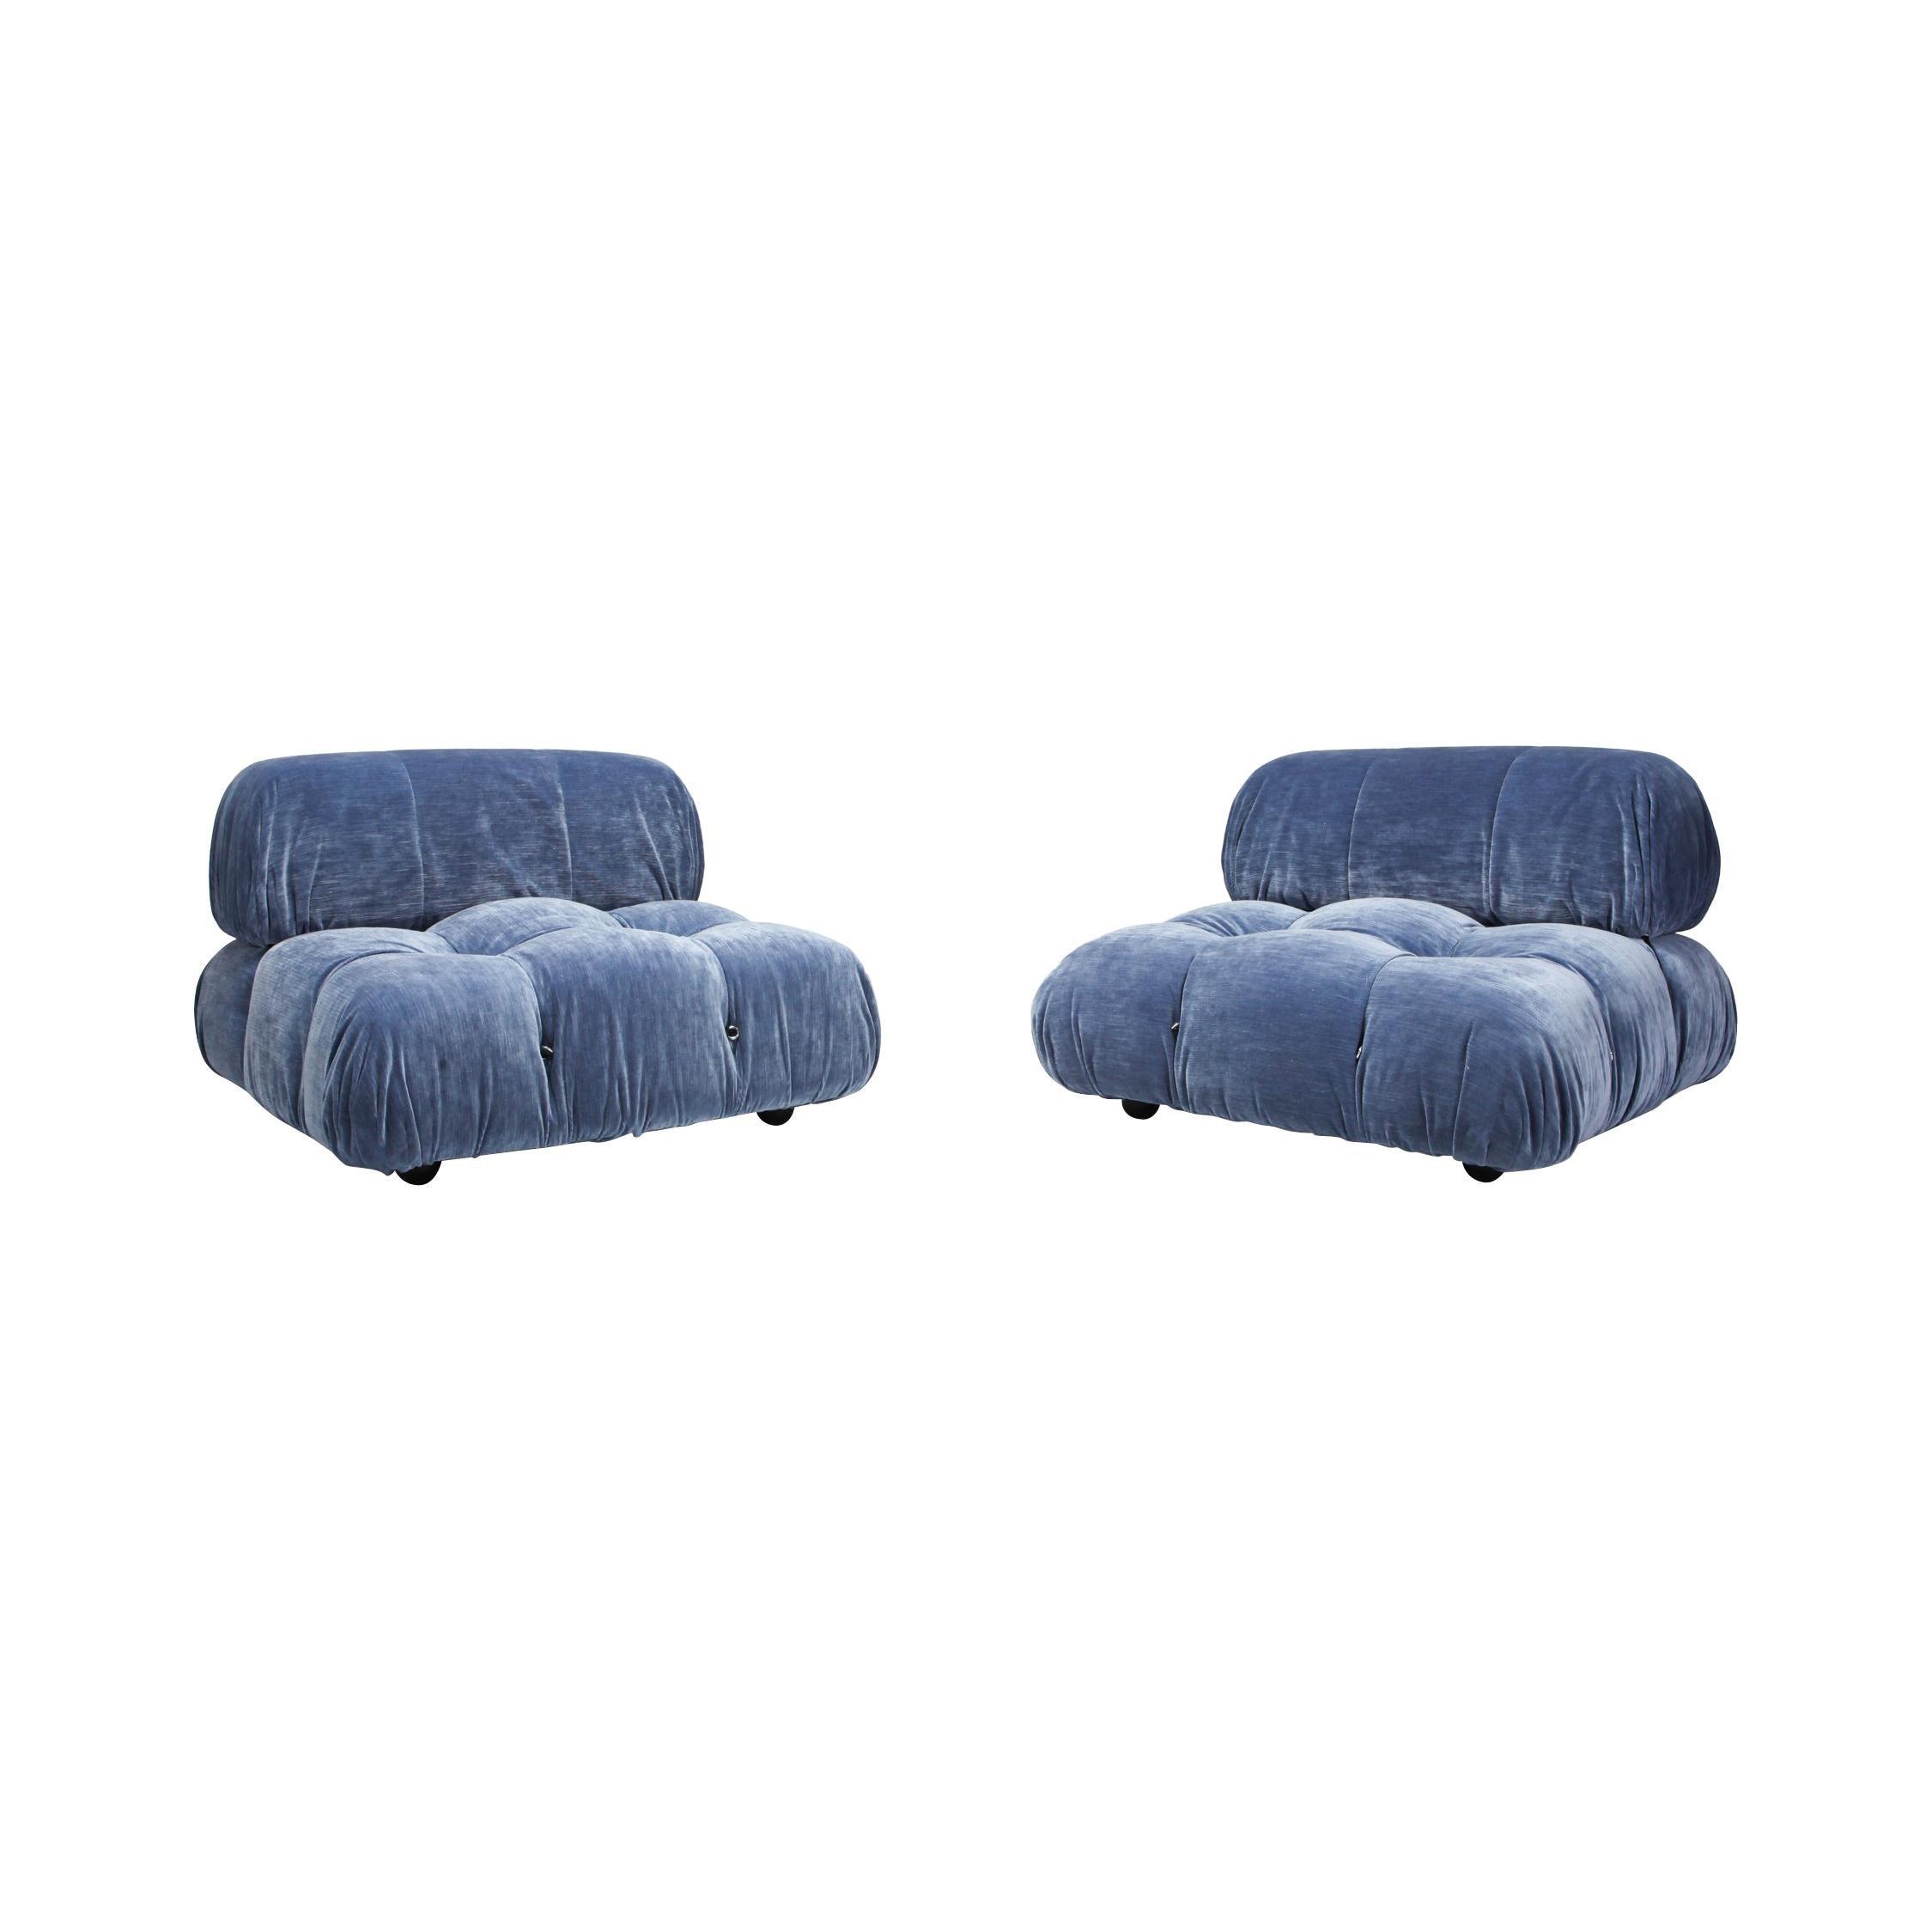 Camaleonda Pair of lounge chair by Mario Bellini